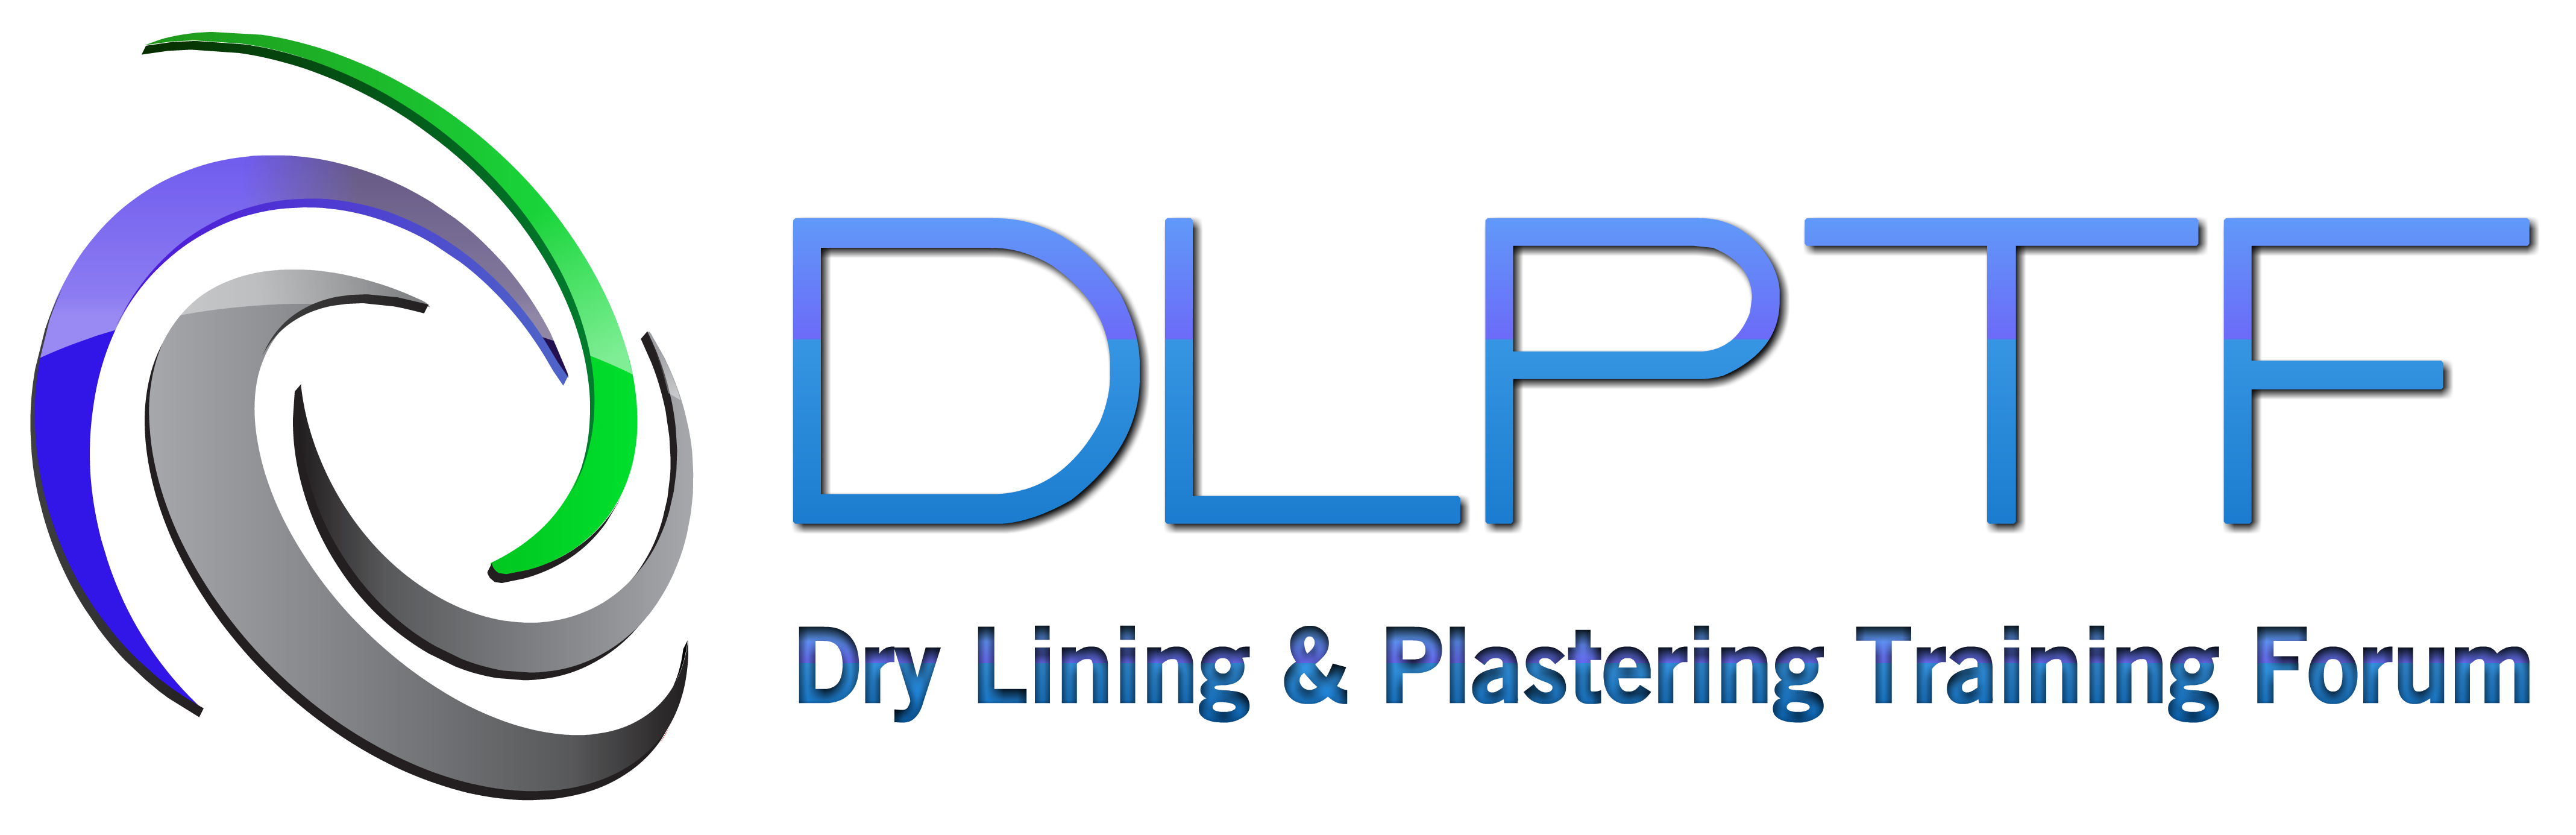 DLPTF | Dry Lining & Plastering Training Forum